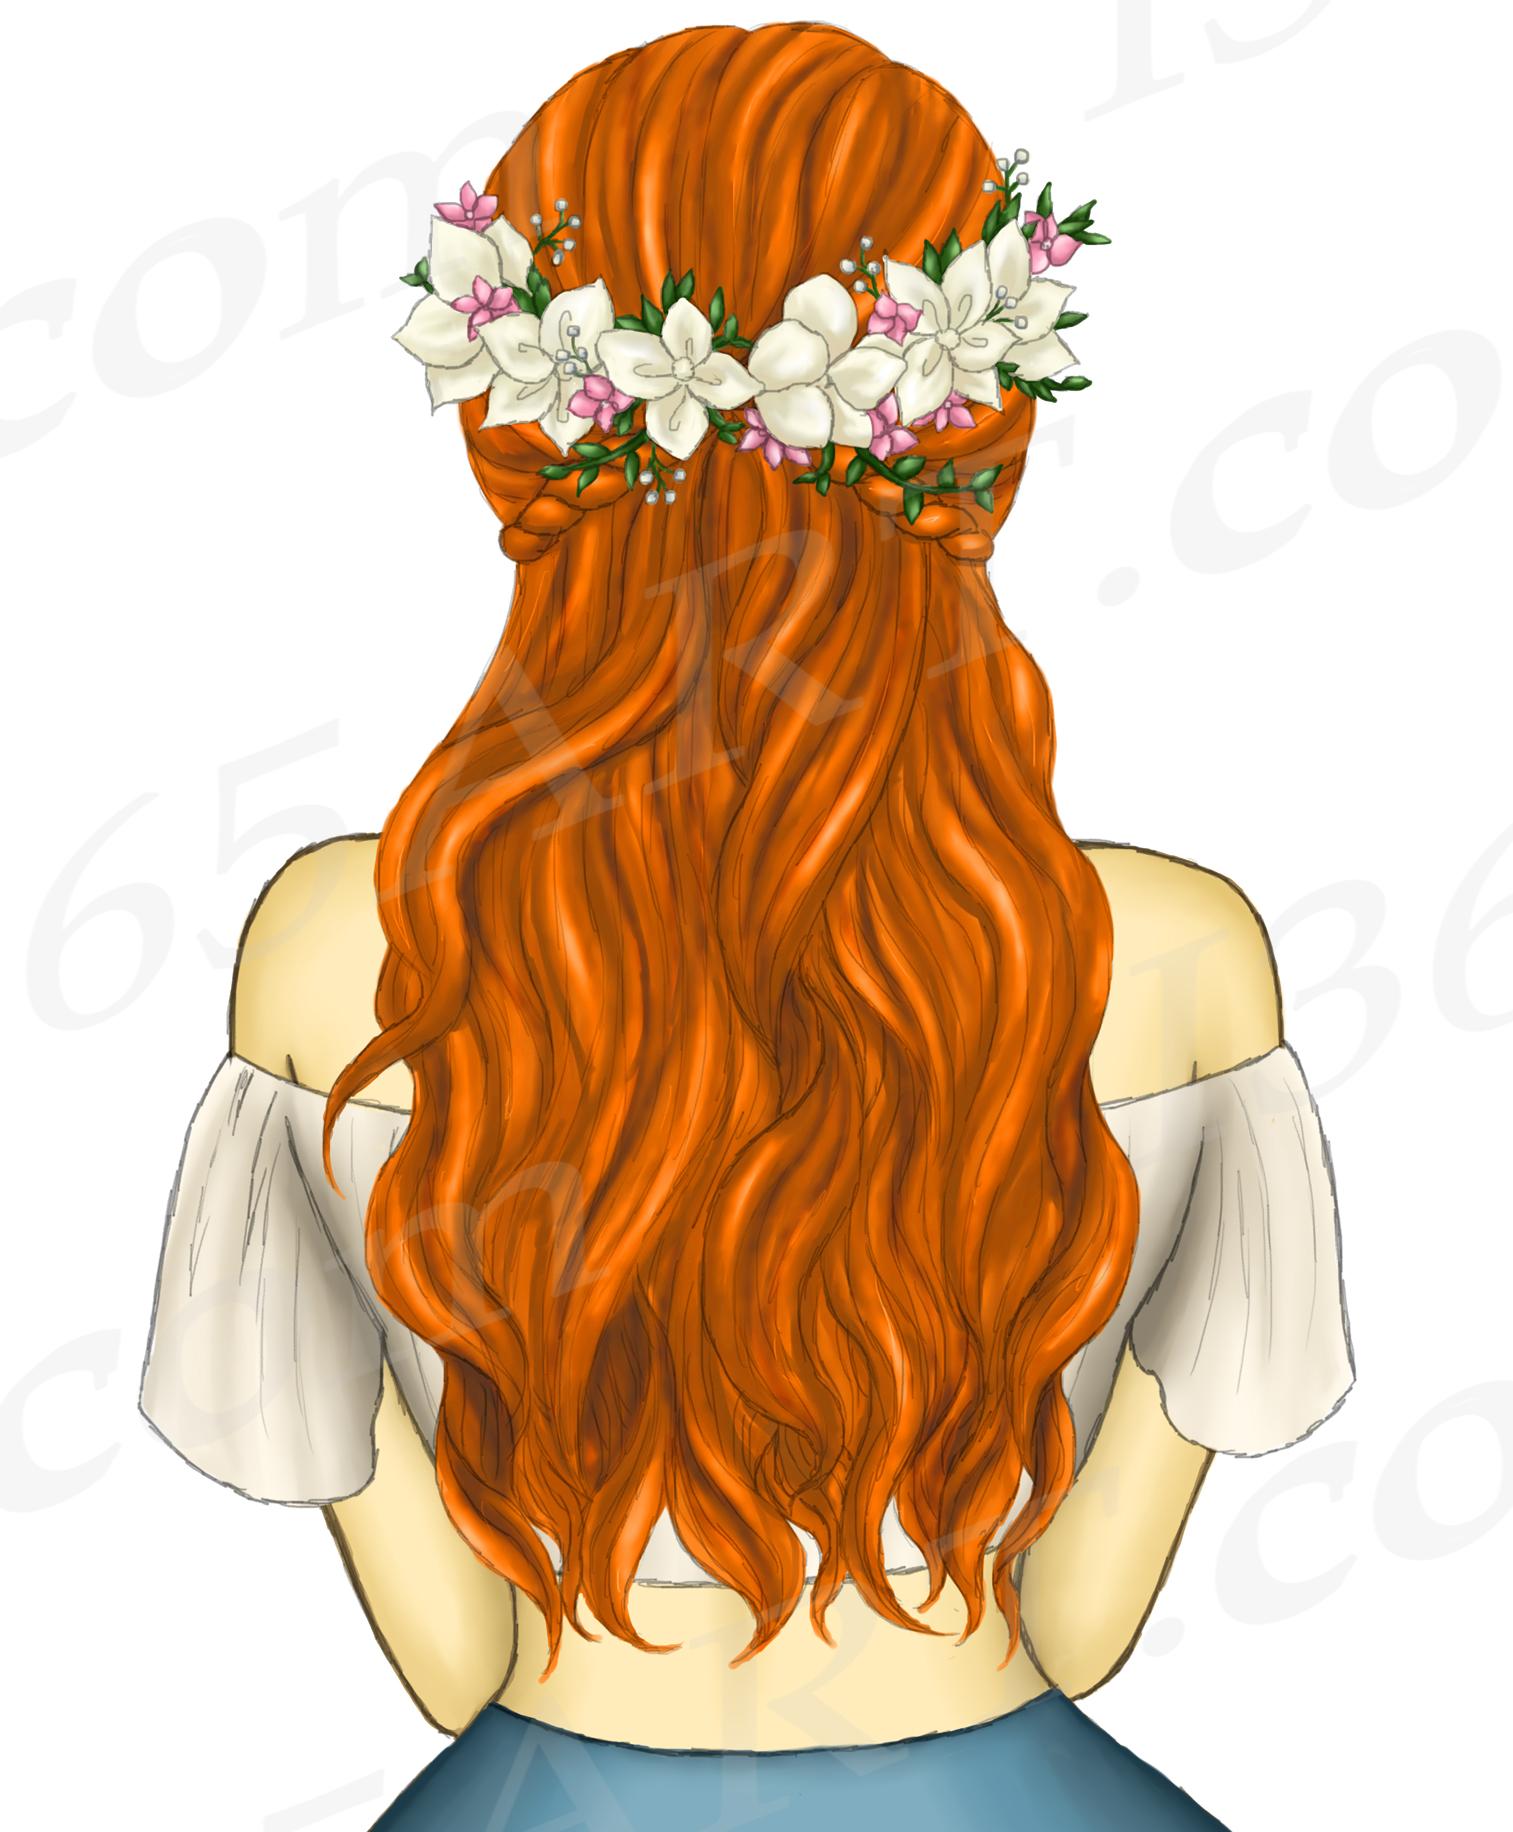 Boho Ginger Red Hair Girls Fashion Clipart, Flower Wreath.